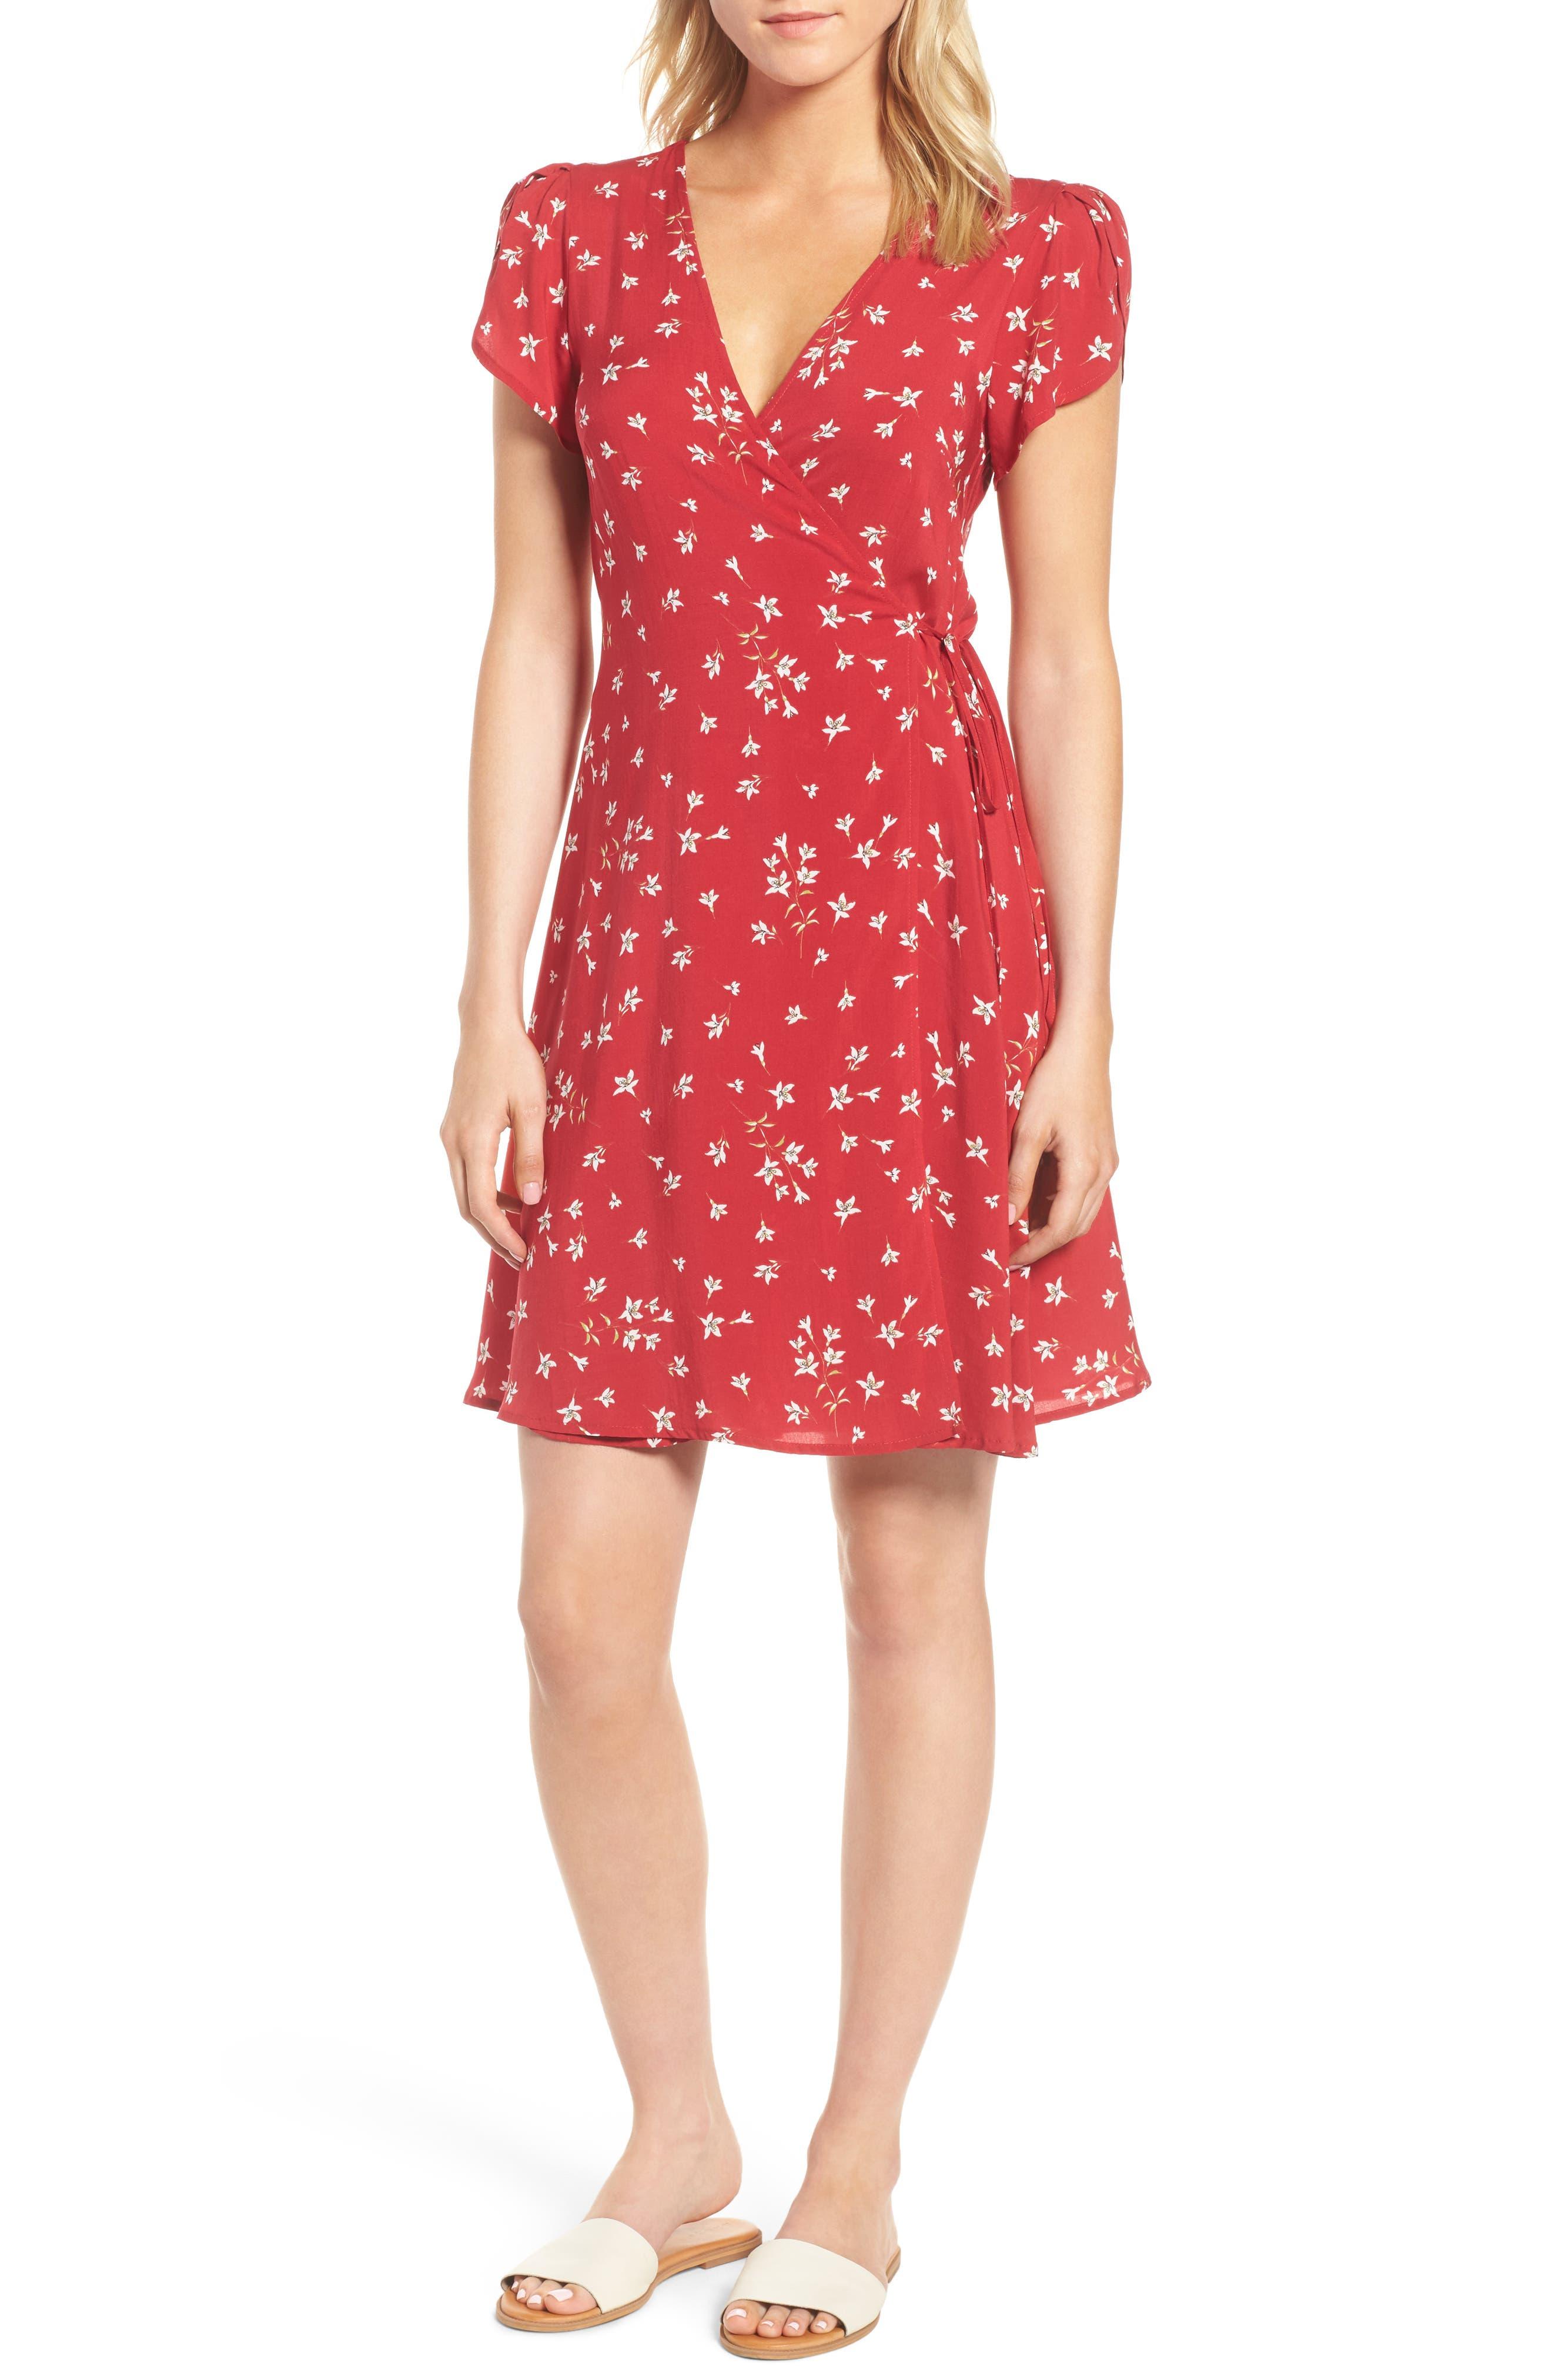 Velvet by Graham & Spencer Spring Floral Wrap Dress